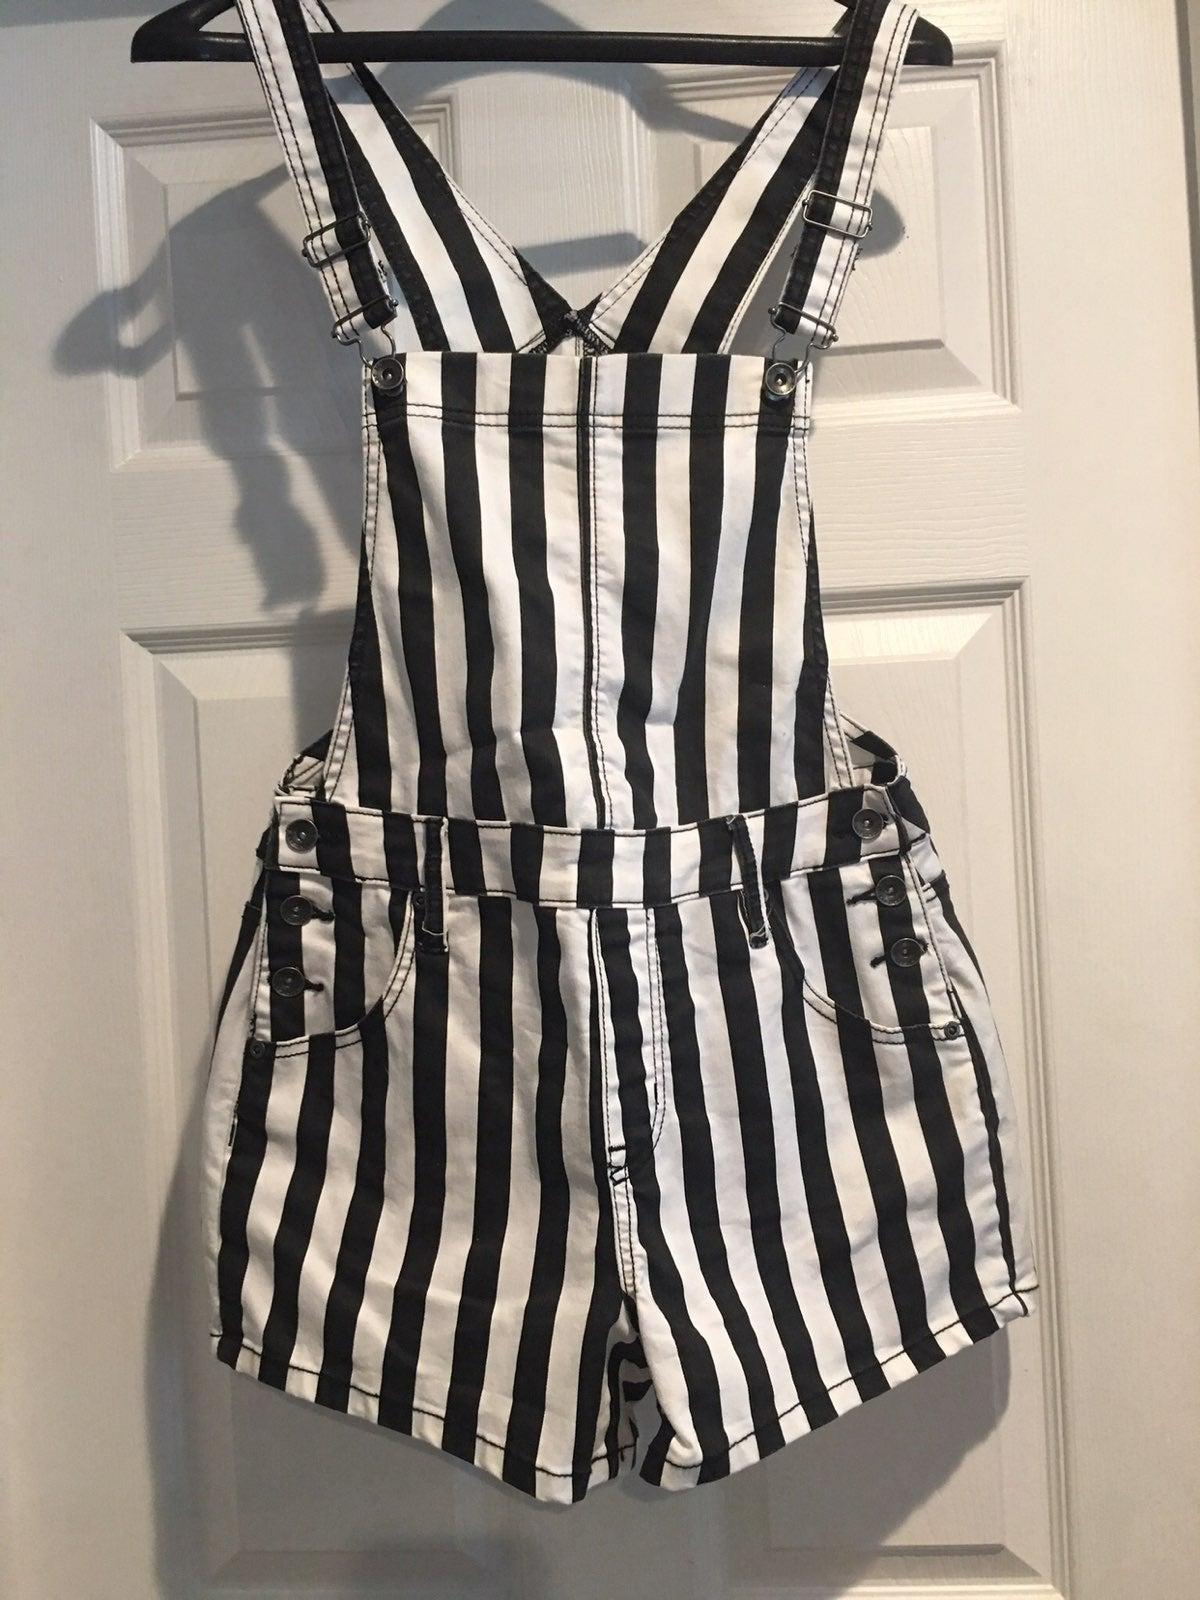 Blackheart overalls